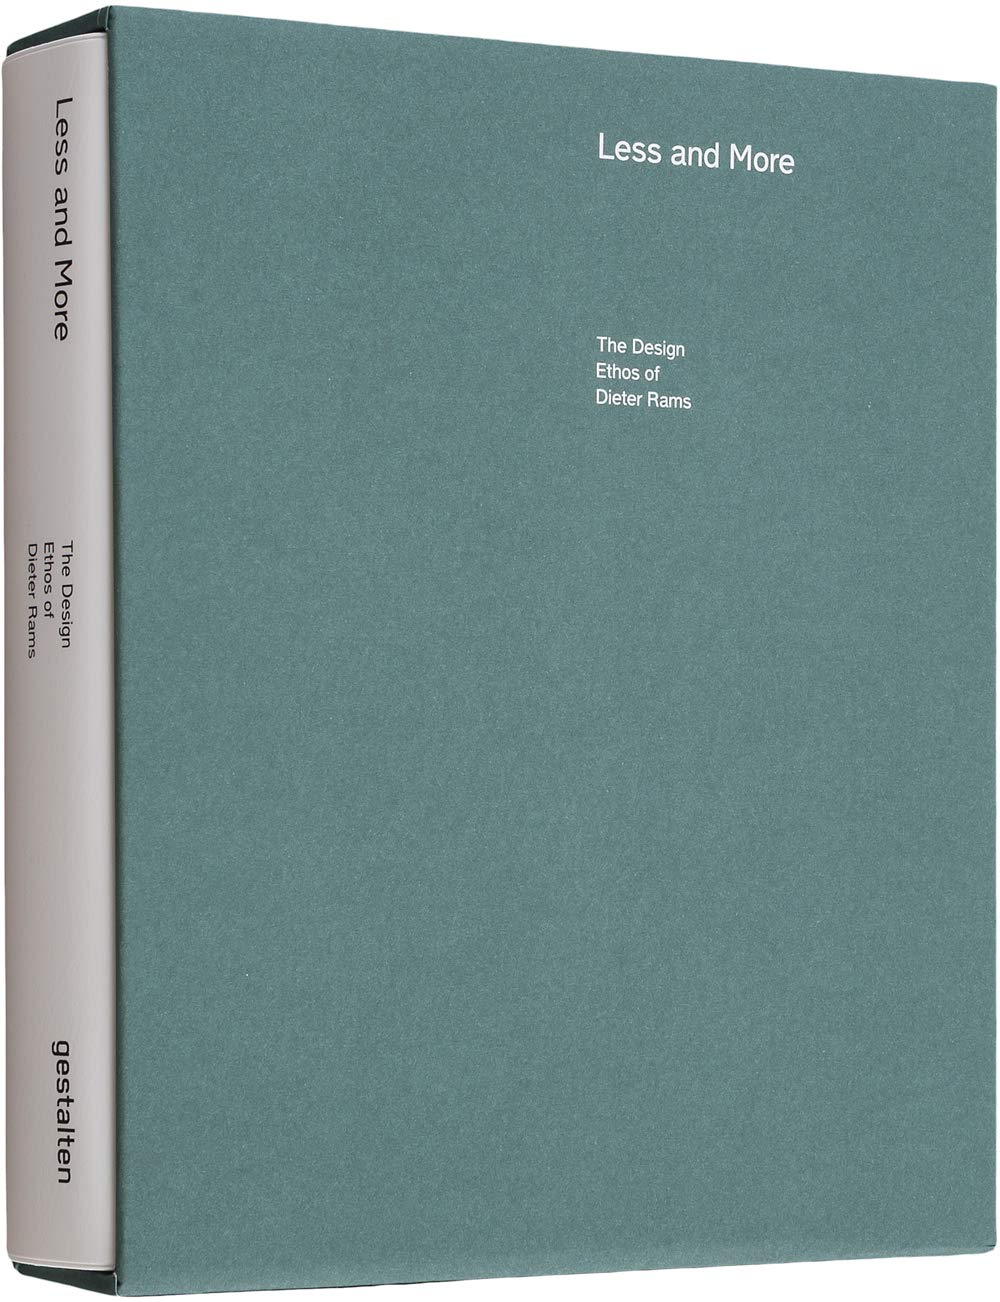 Design dieter ebook download as possible little as rams